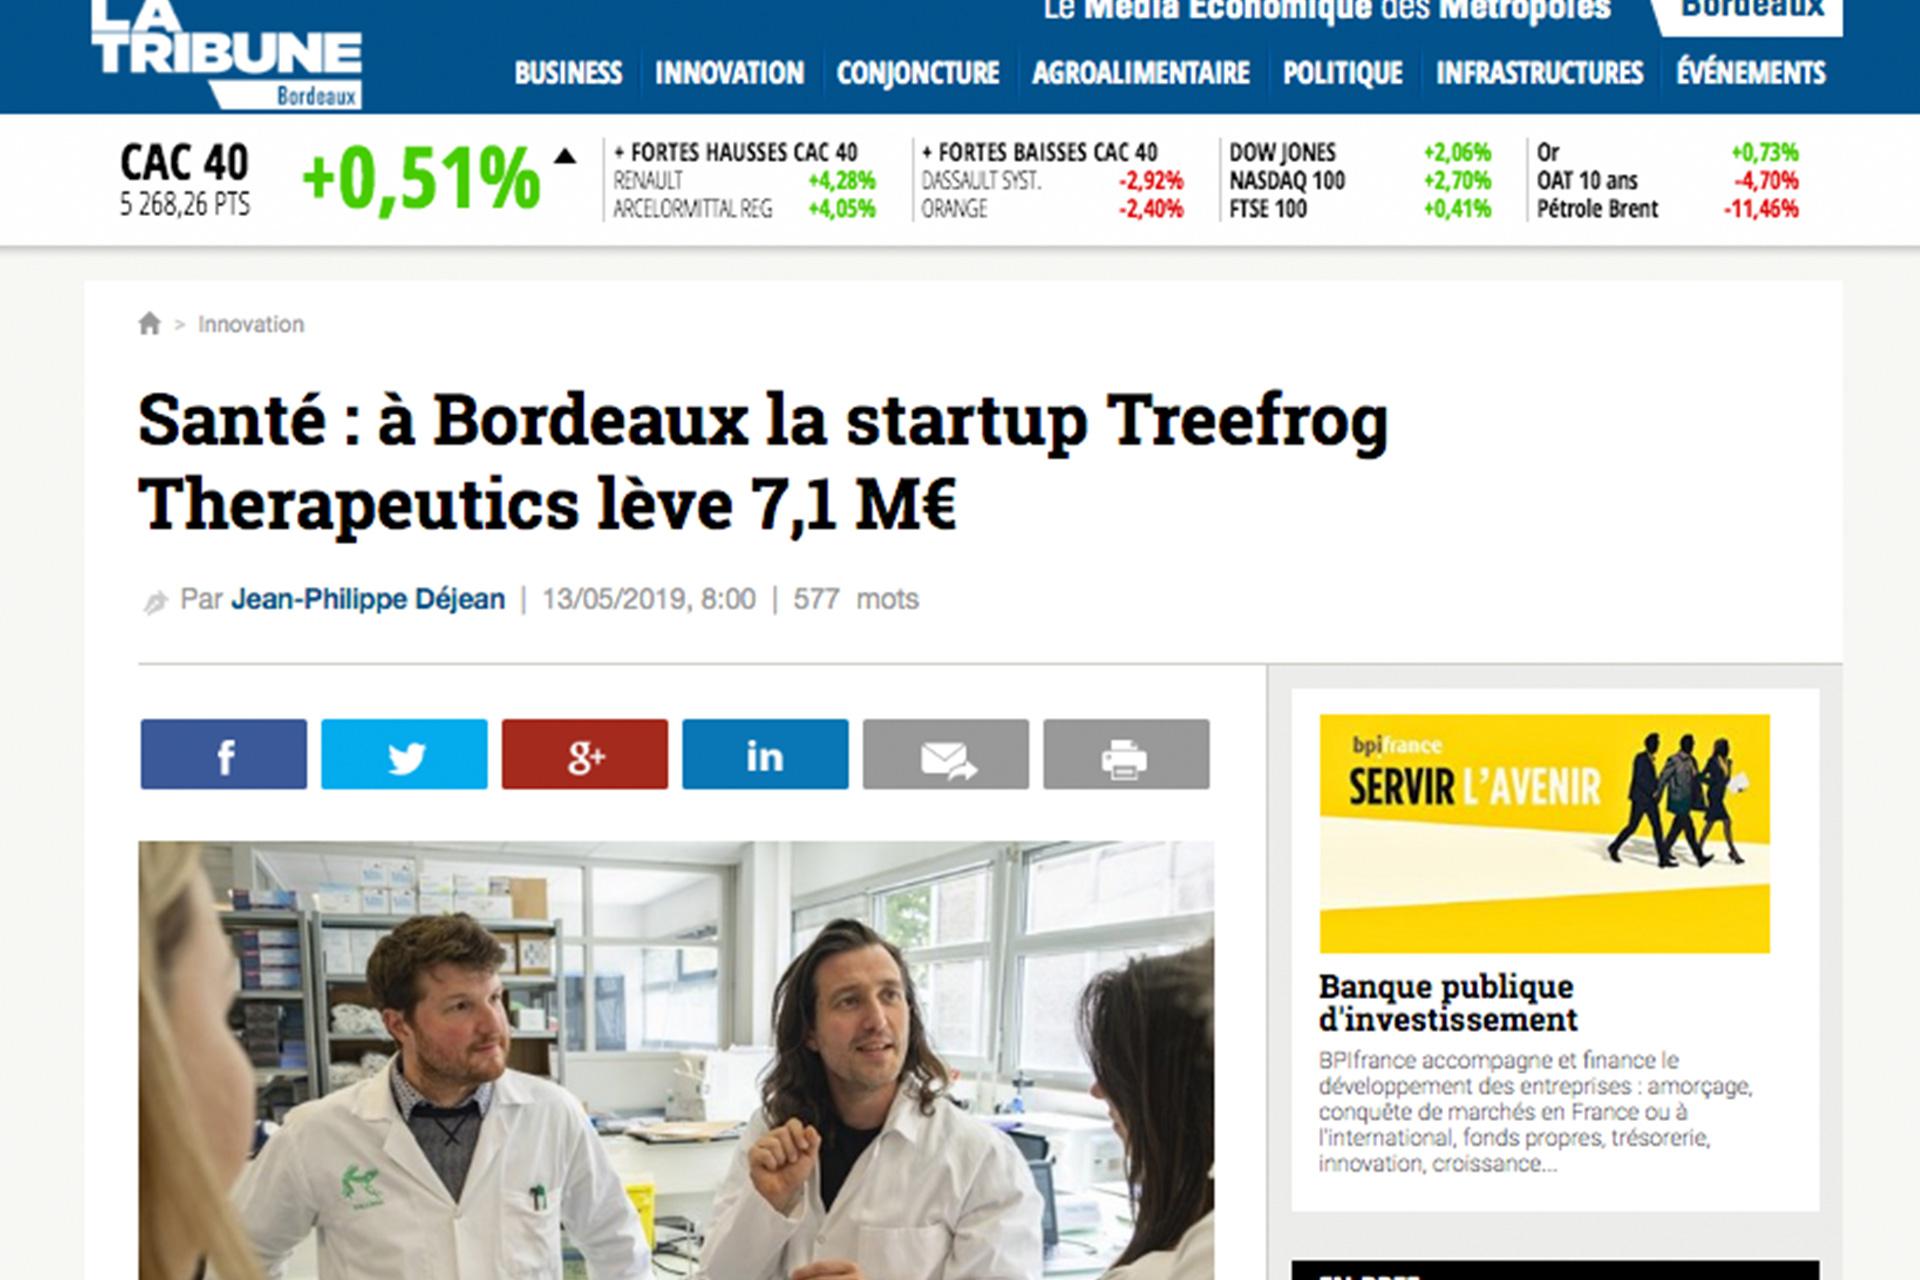 "La Tribune : ""In Bordeaux, TreeFrog Therapeutic raises 7,1 M€"""